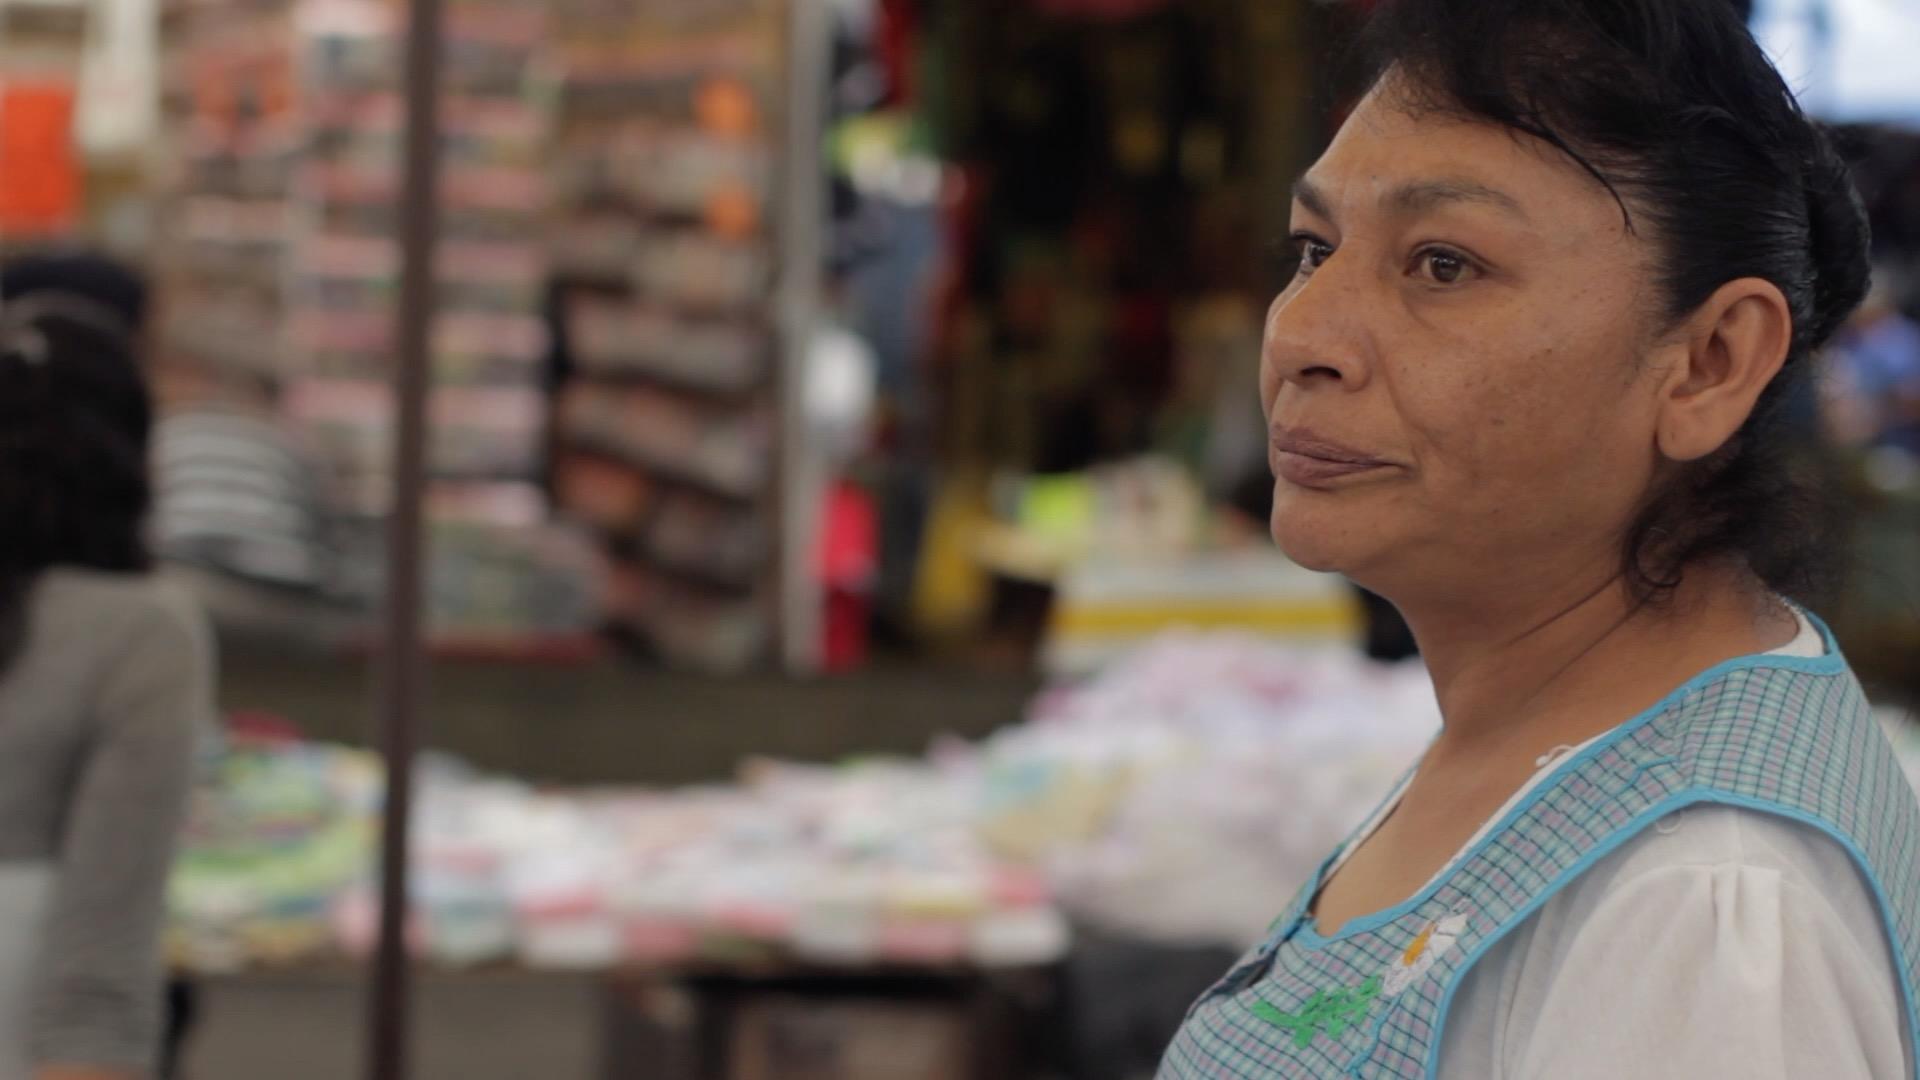 Rehana Zaman, Lourdes, video still, 2018